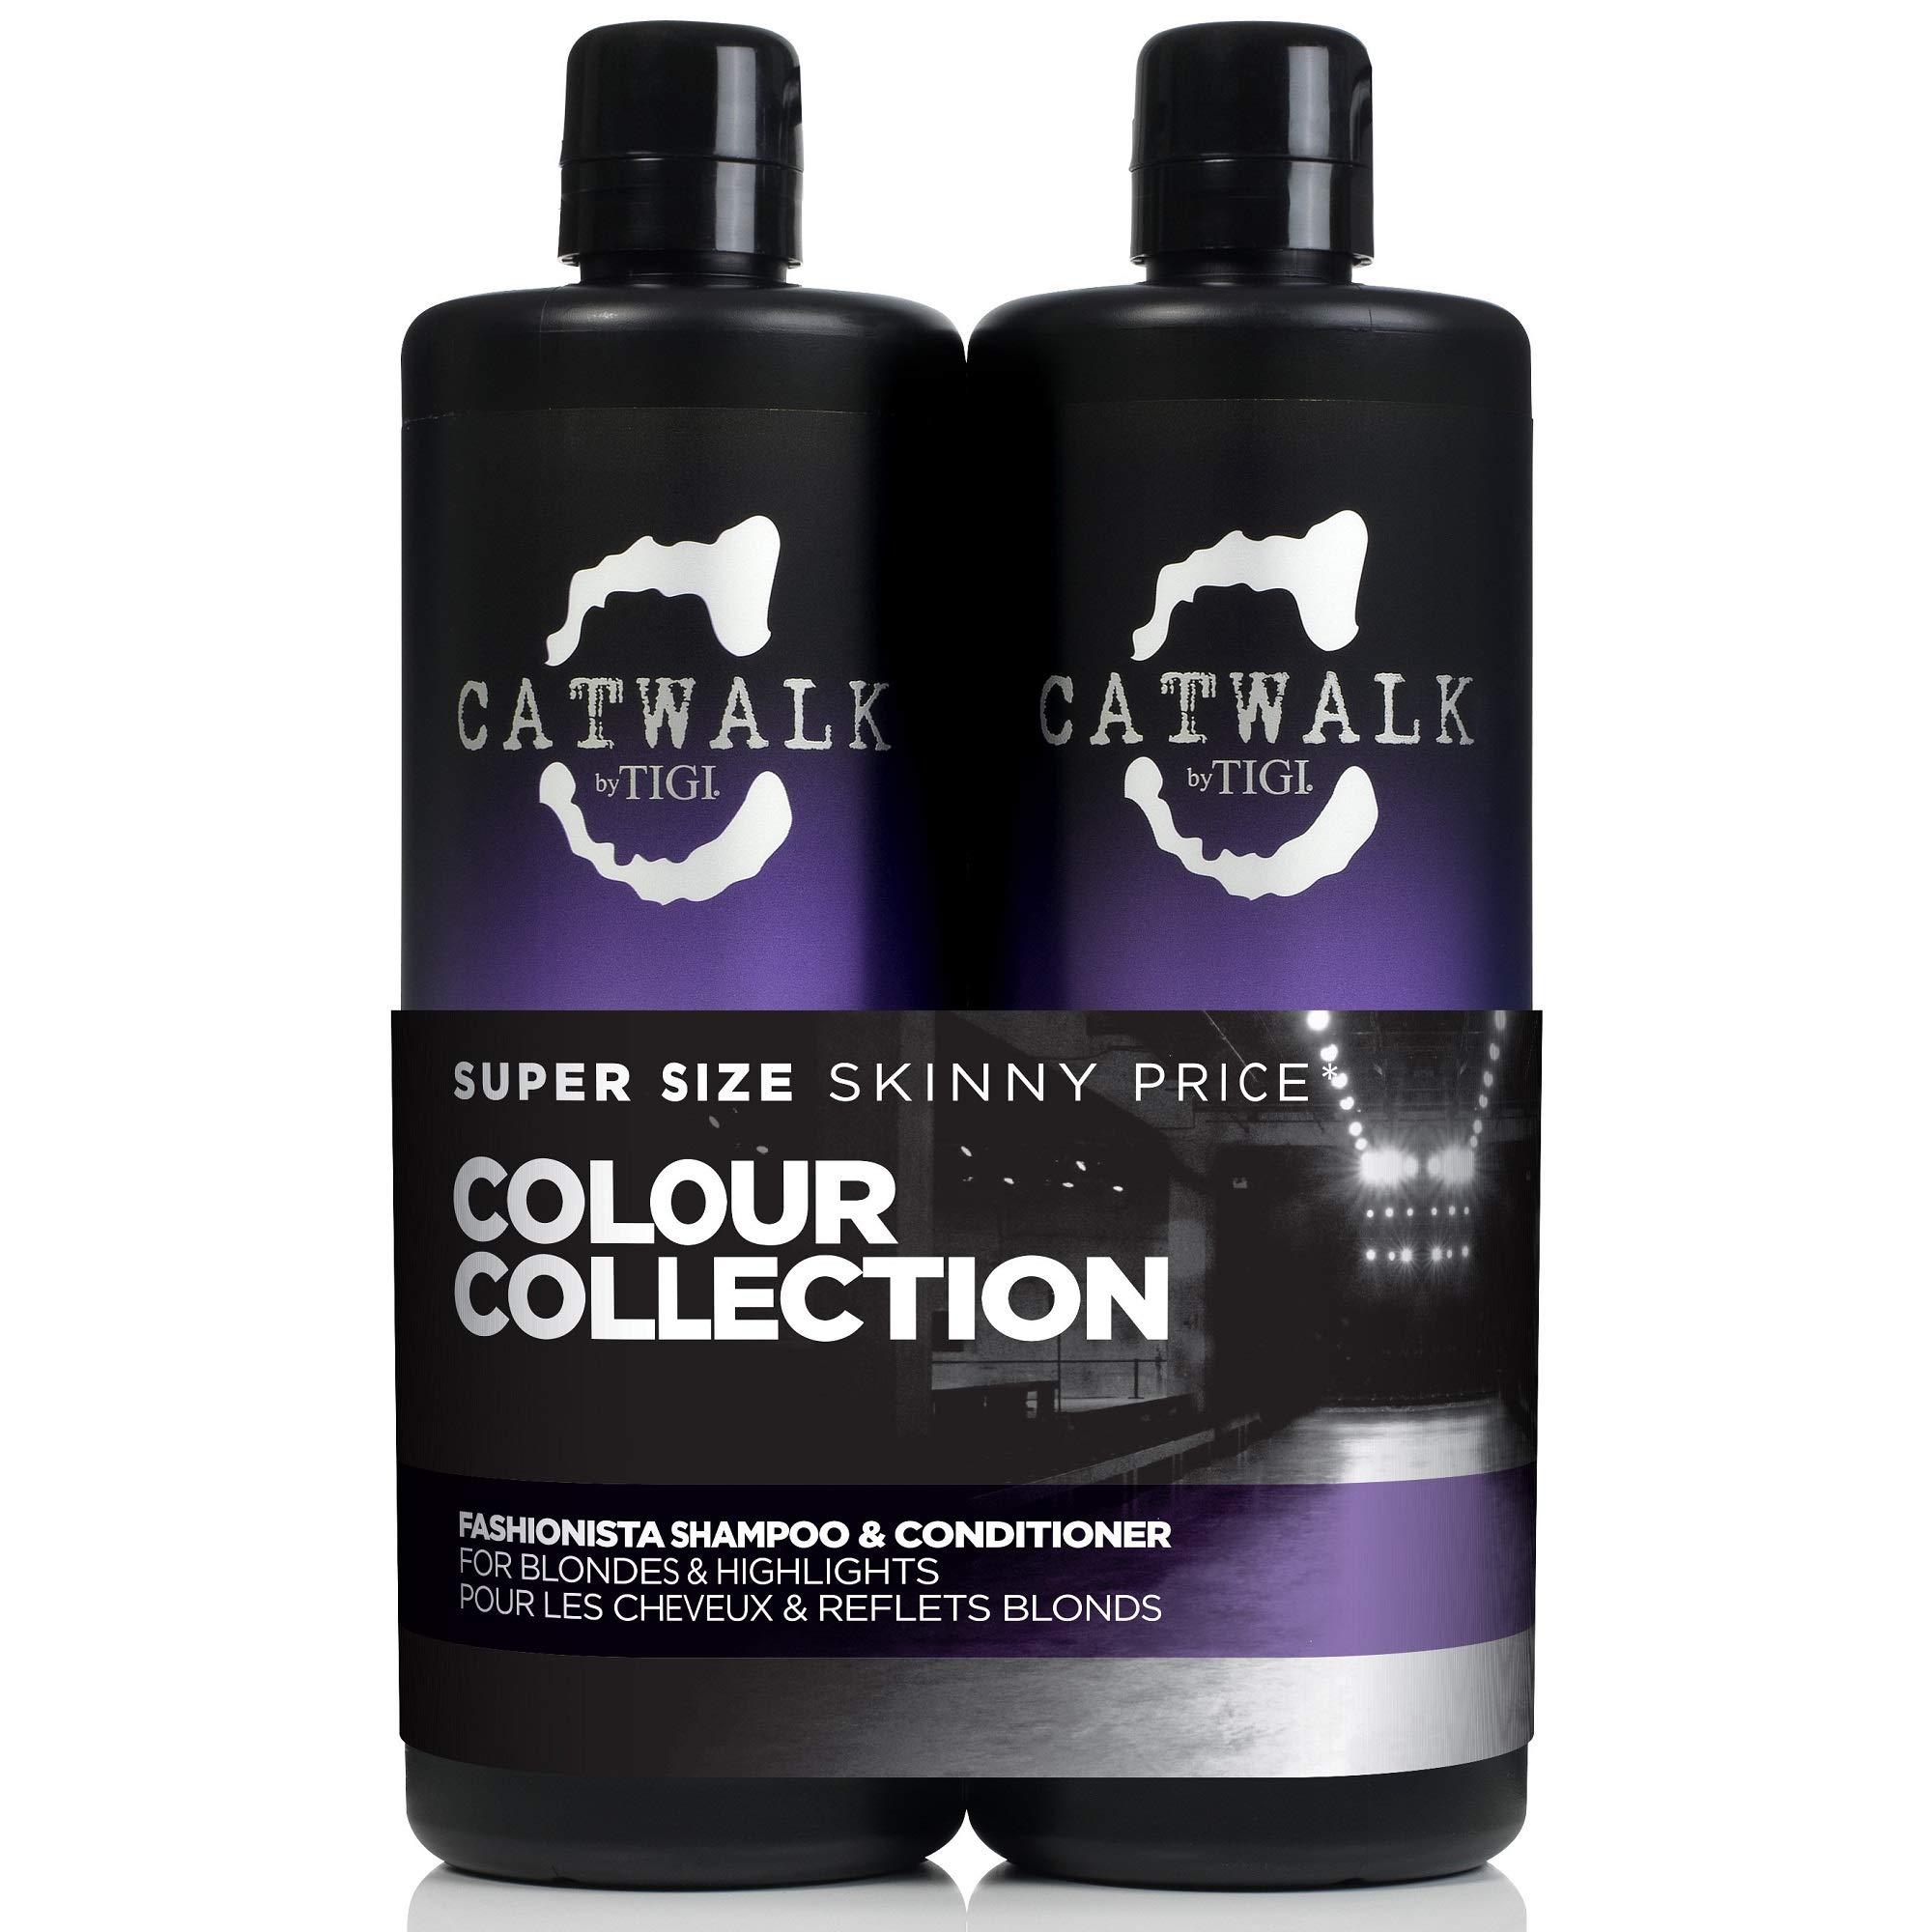 Catwalk by Tigi Fashionista Purple Shampoo and Conditioner for Blonde Hair 2 x 750 ml